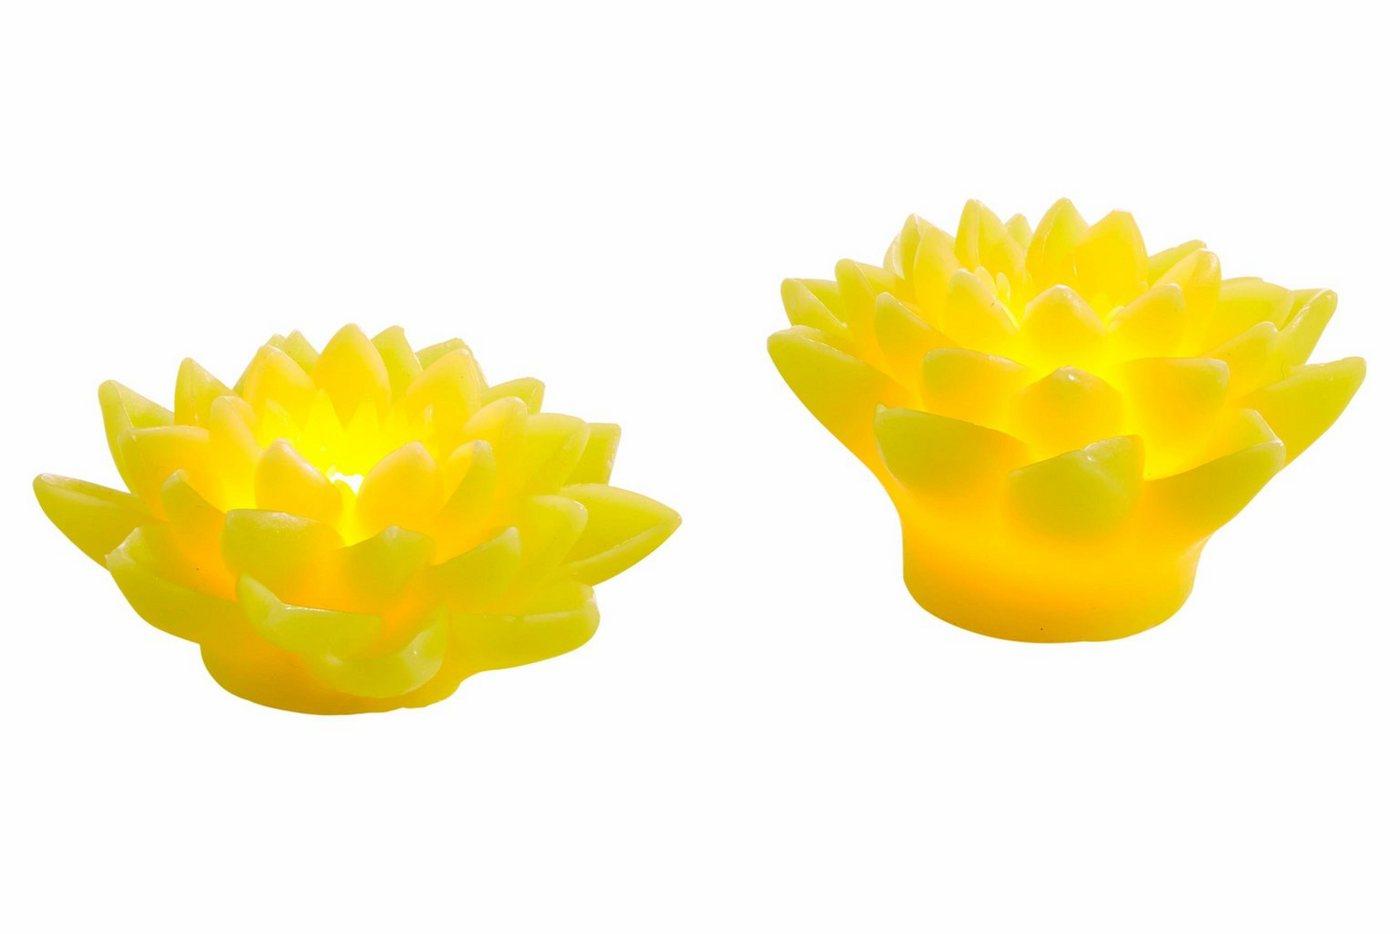 LED Deko-Lotusblum, ca. 12cm, klein, heine home